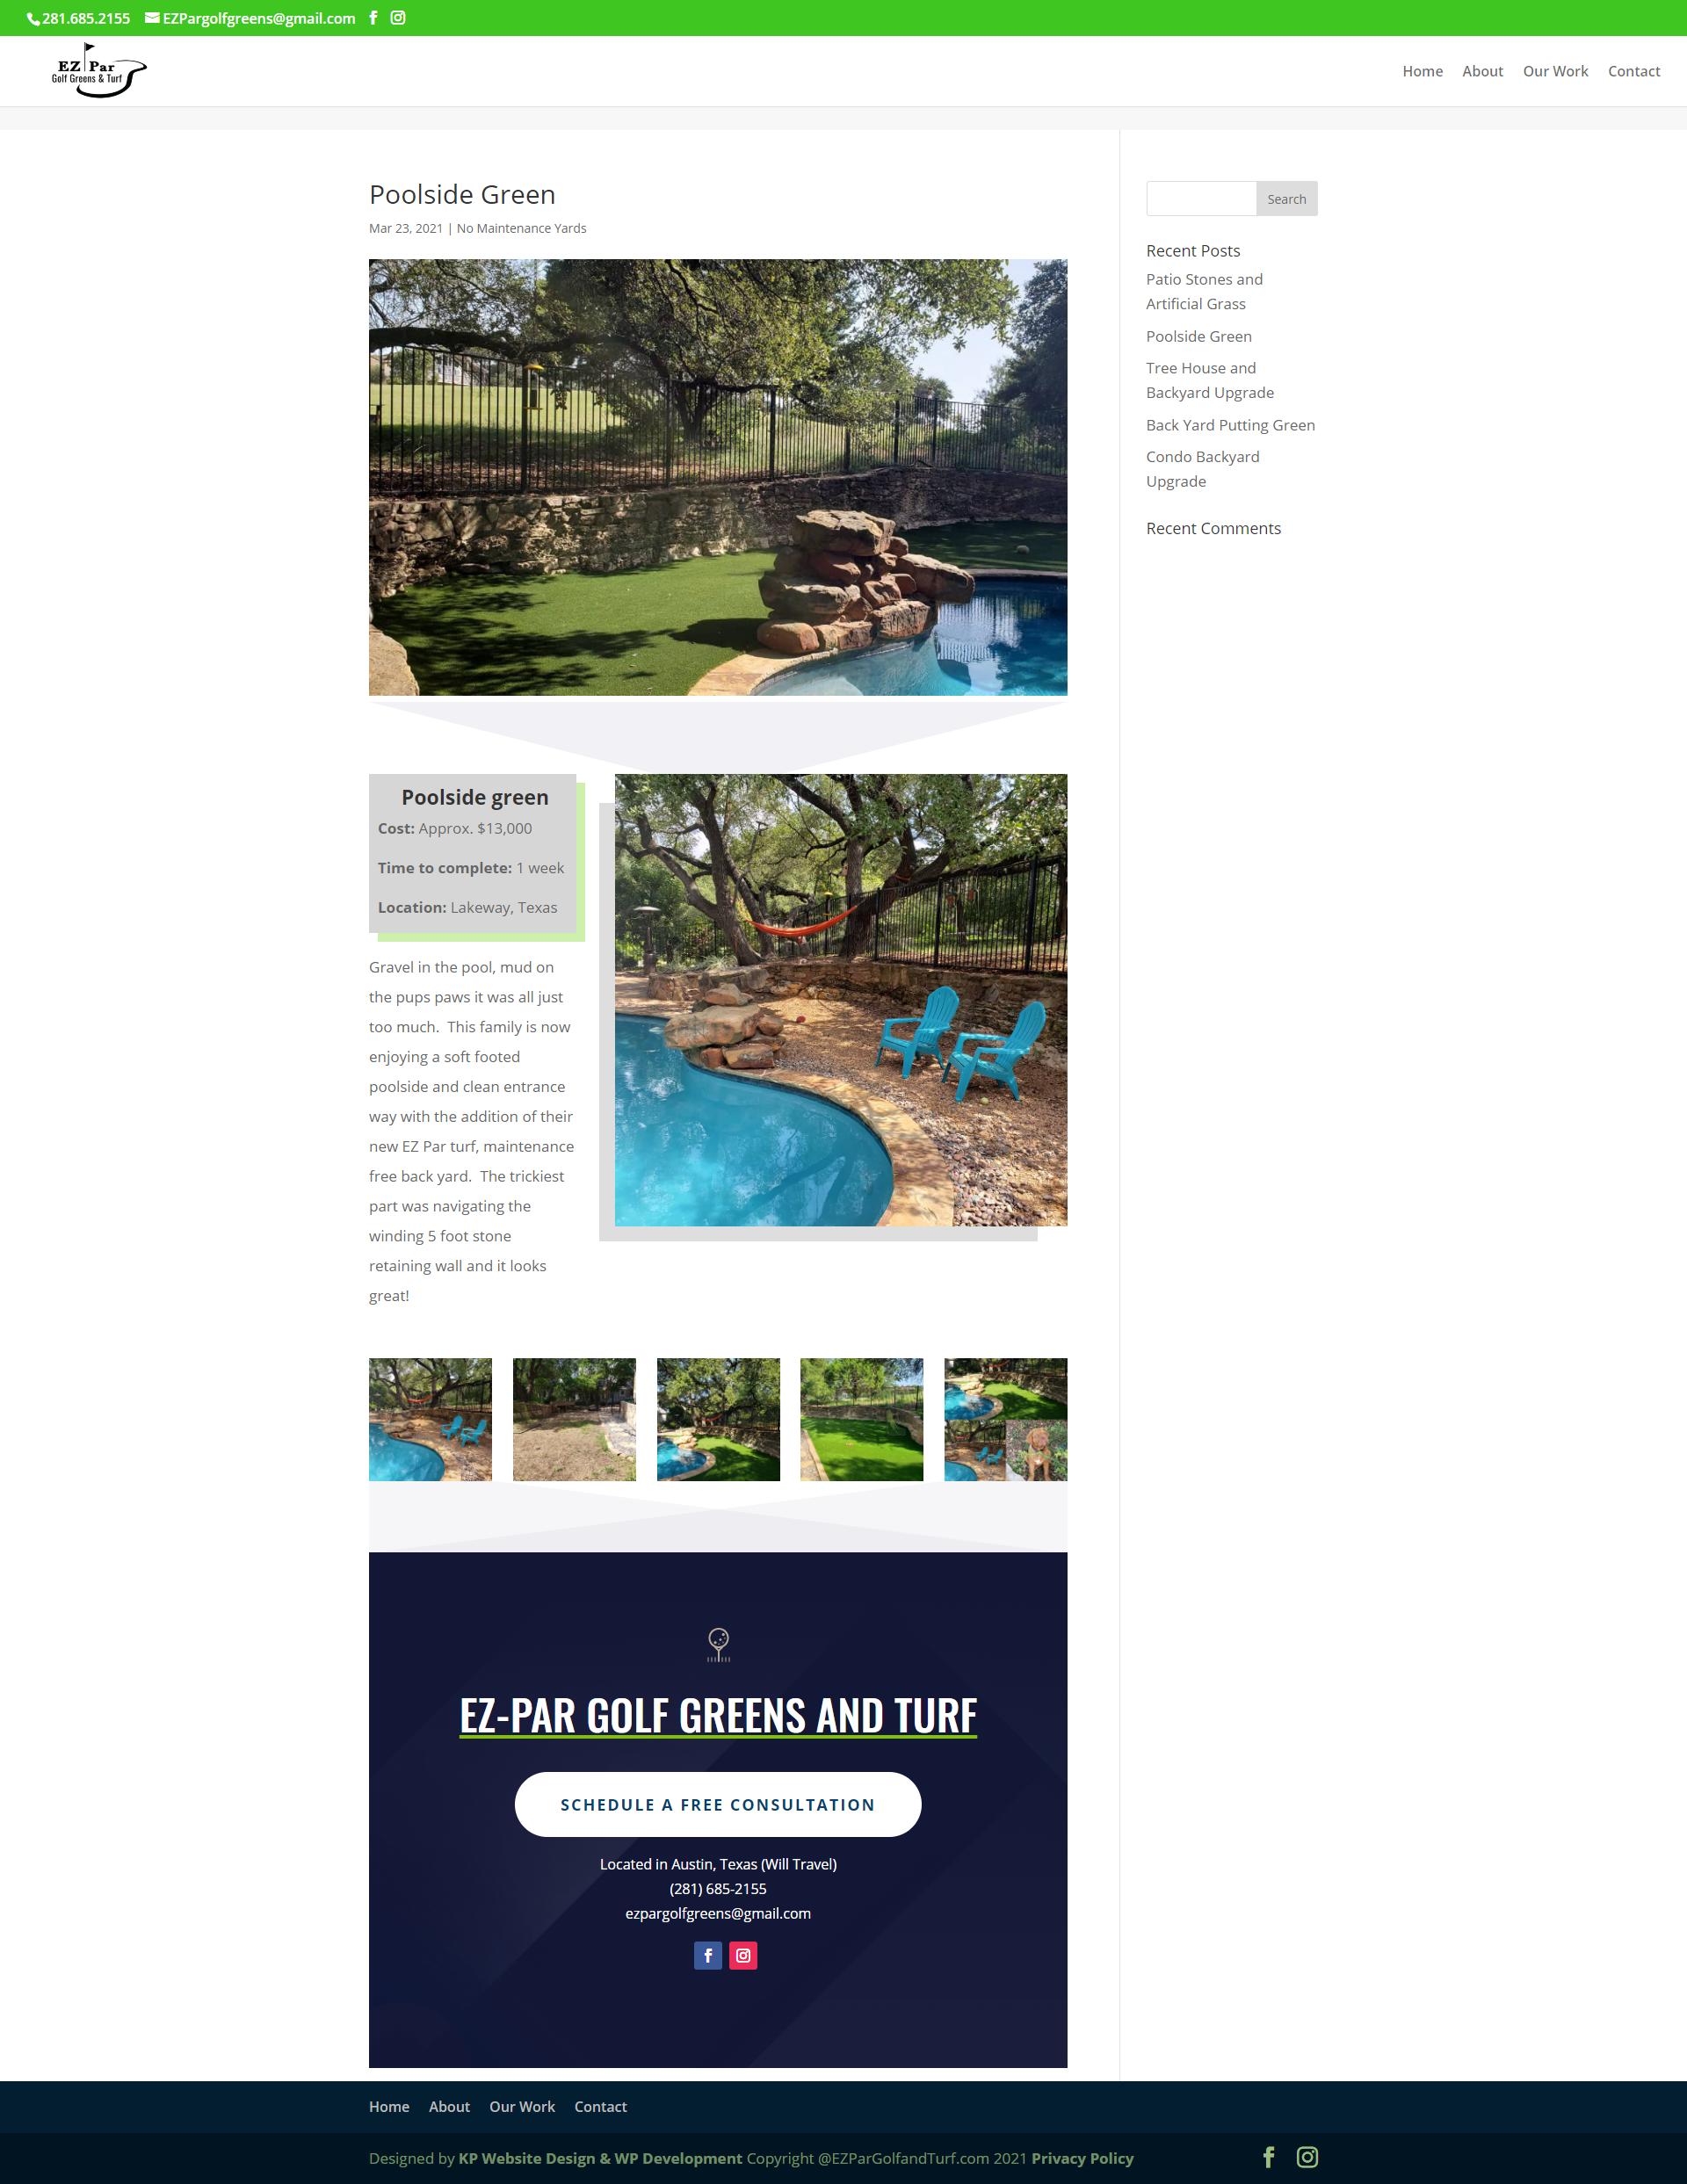 A screen shot of a backyard upgrade by EZPargolf and turf